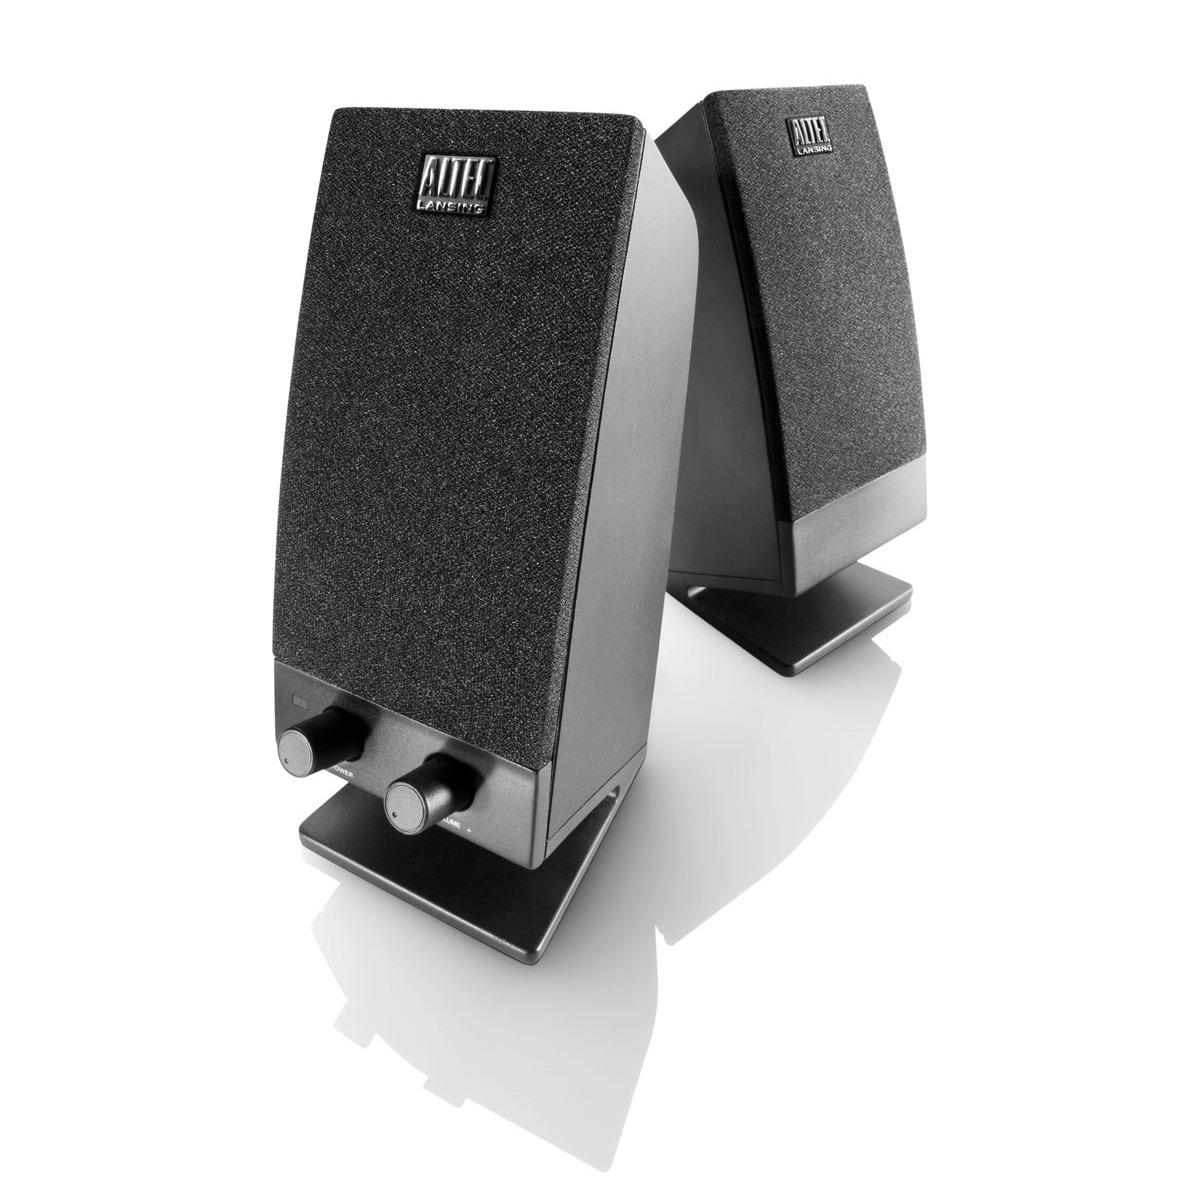 altec lansing bxr1320 enceinte pc altec lansing sur. Black Bedroom Furniture Sets. Home Design Ideas